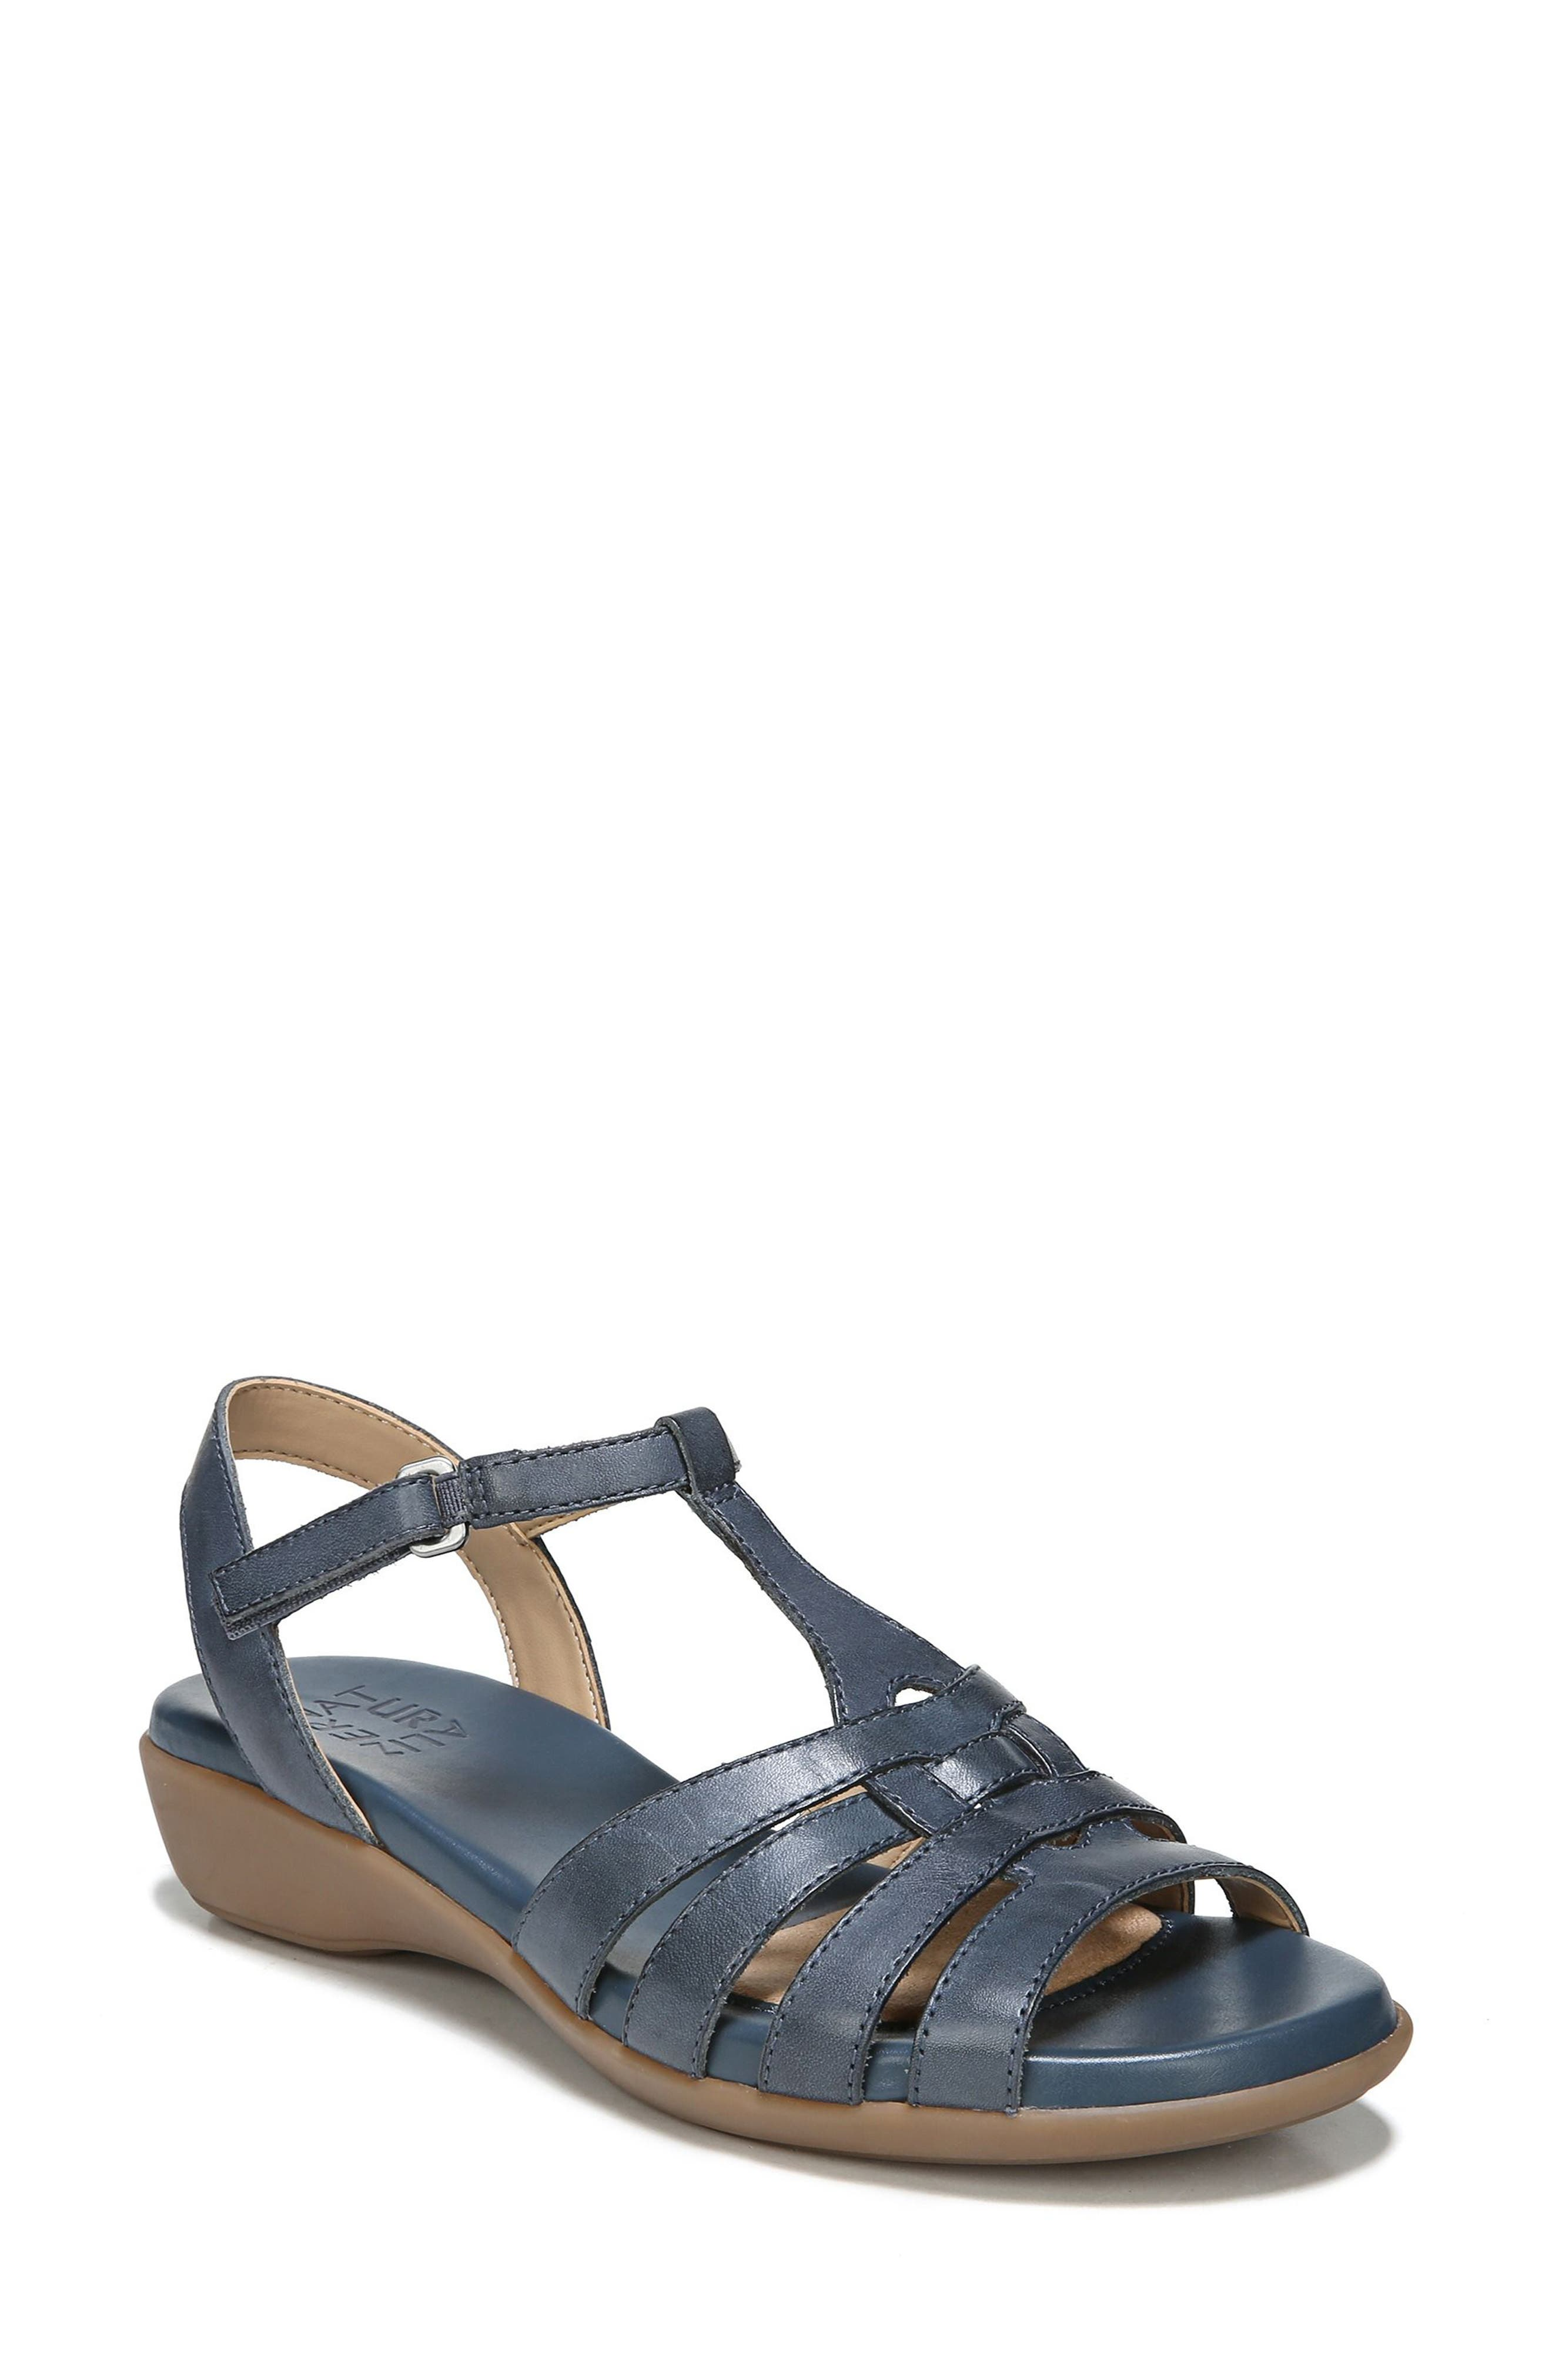 Nanci Sandal,                         Main,                         color, Denim Leather